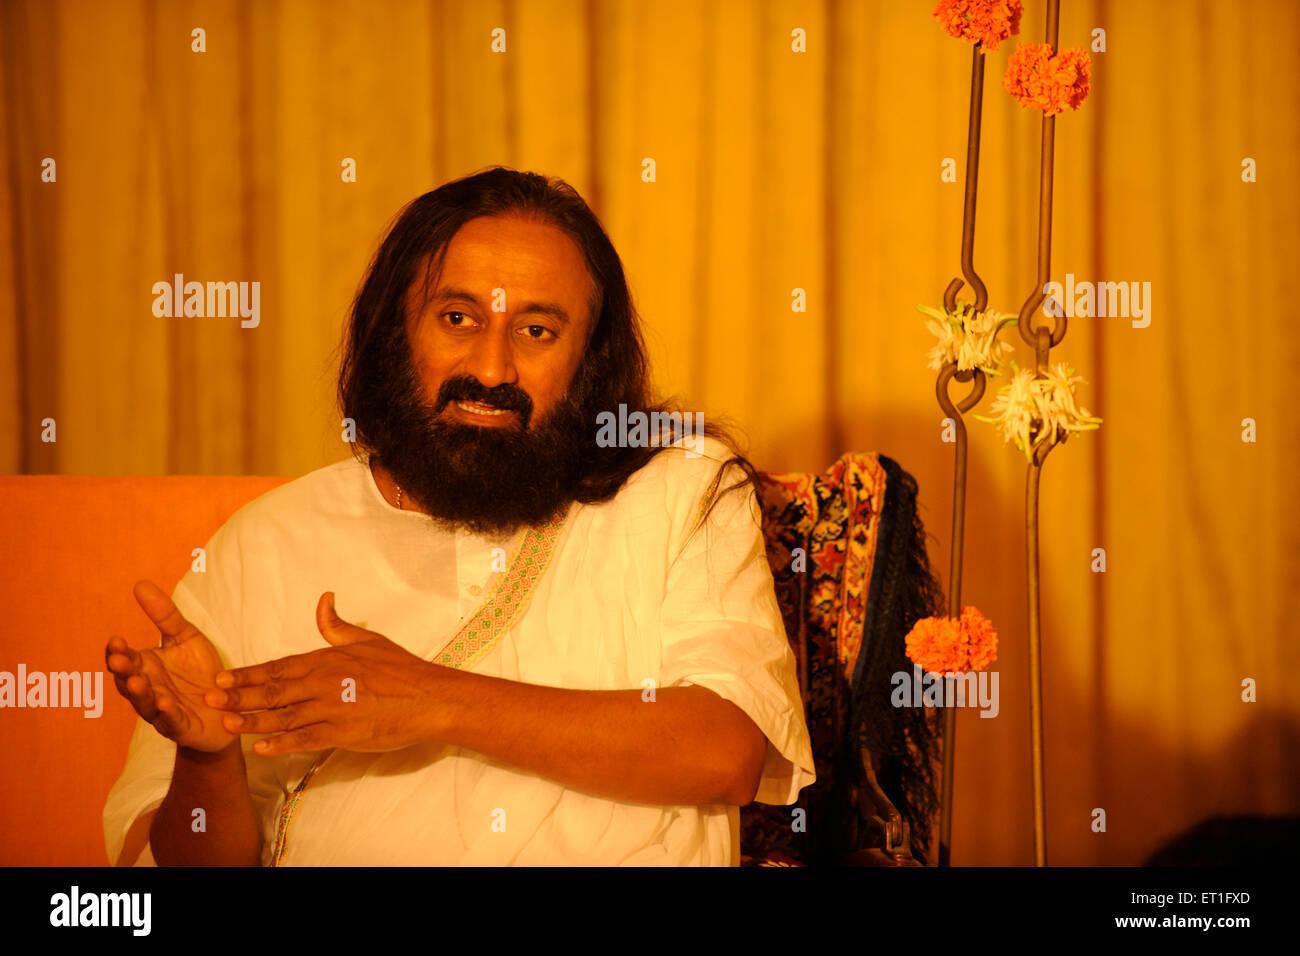 Sri Sri Ravi Shankar spiritual and humanitarian leader ; India NO MR - Stock Image